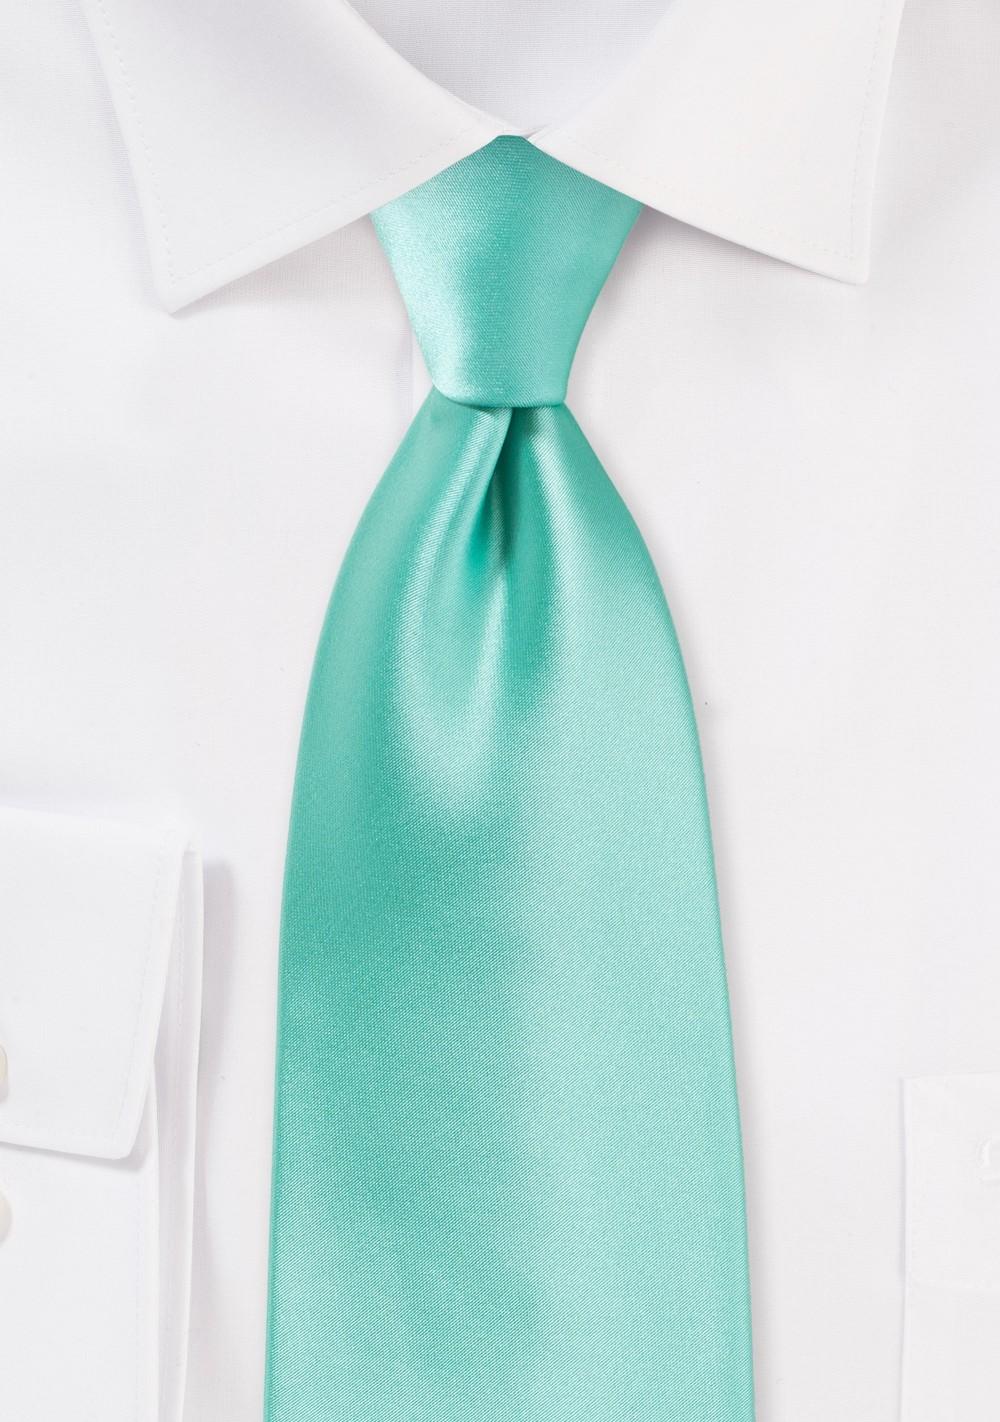 Beach Glass Colored Necktie